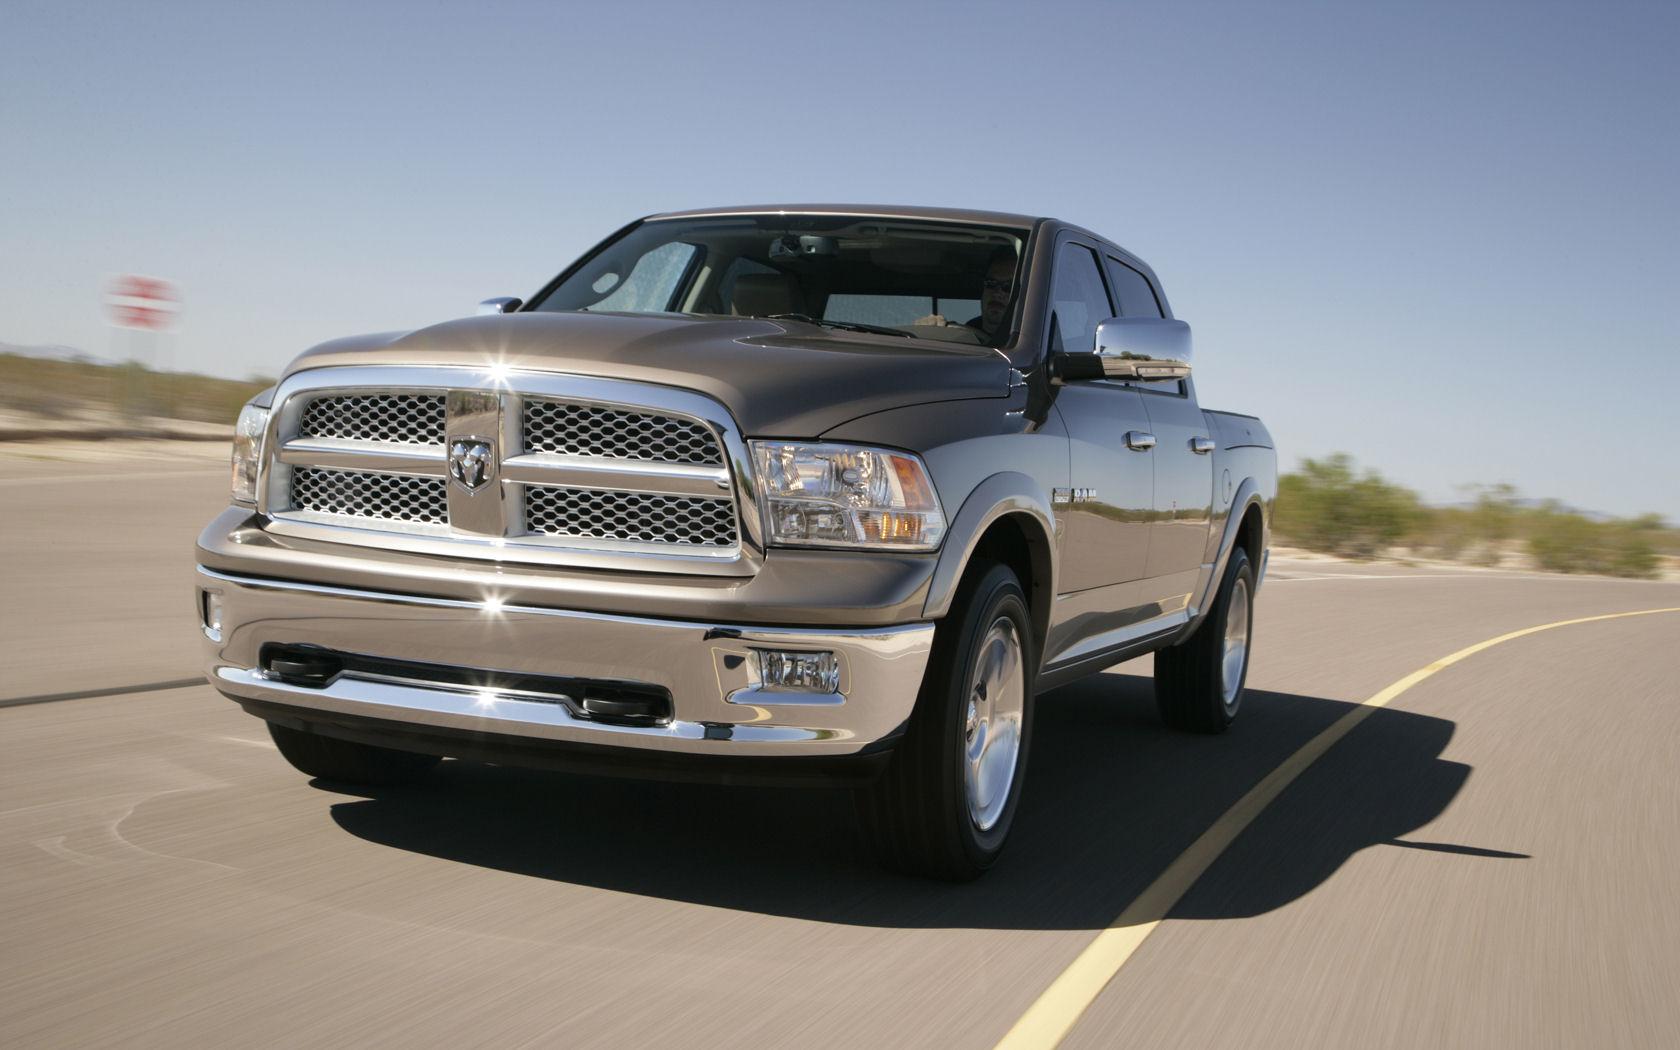 Dodge Ram 1500 Wallpaper 4873 Hd Wallpapers in Cars   Imagesci 1680x1050